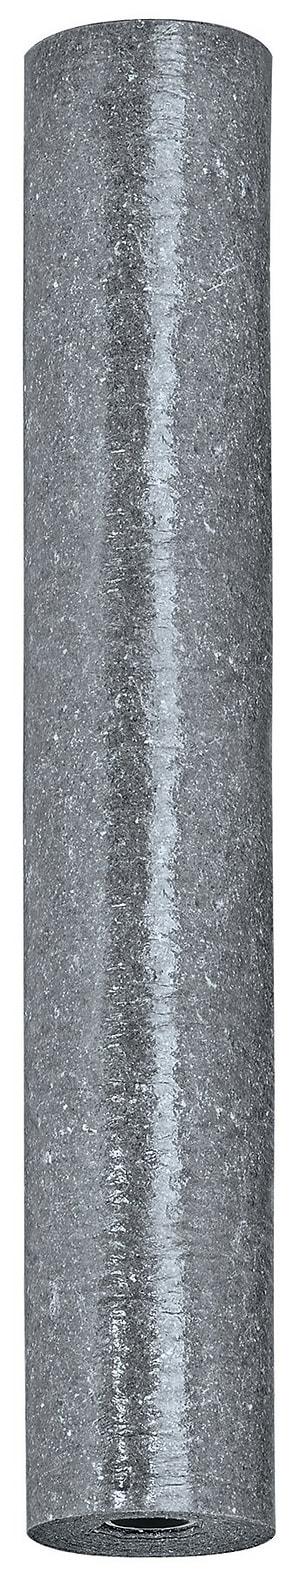 Saugvlies Baumwolle 1m x 10m, bunt